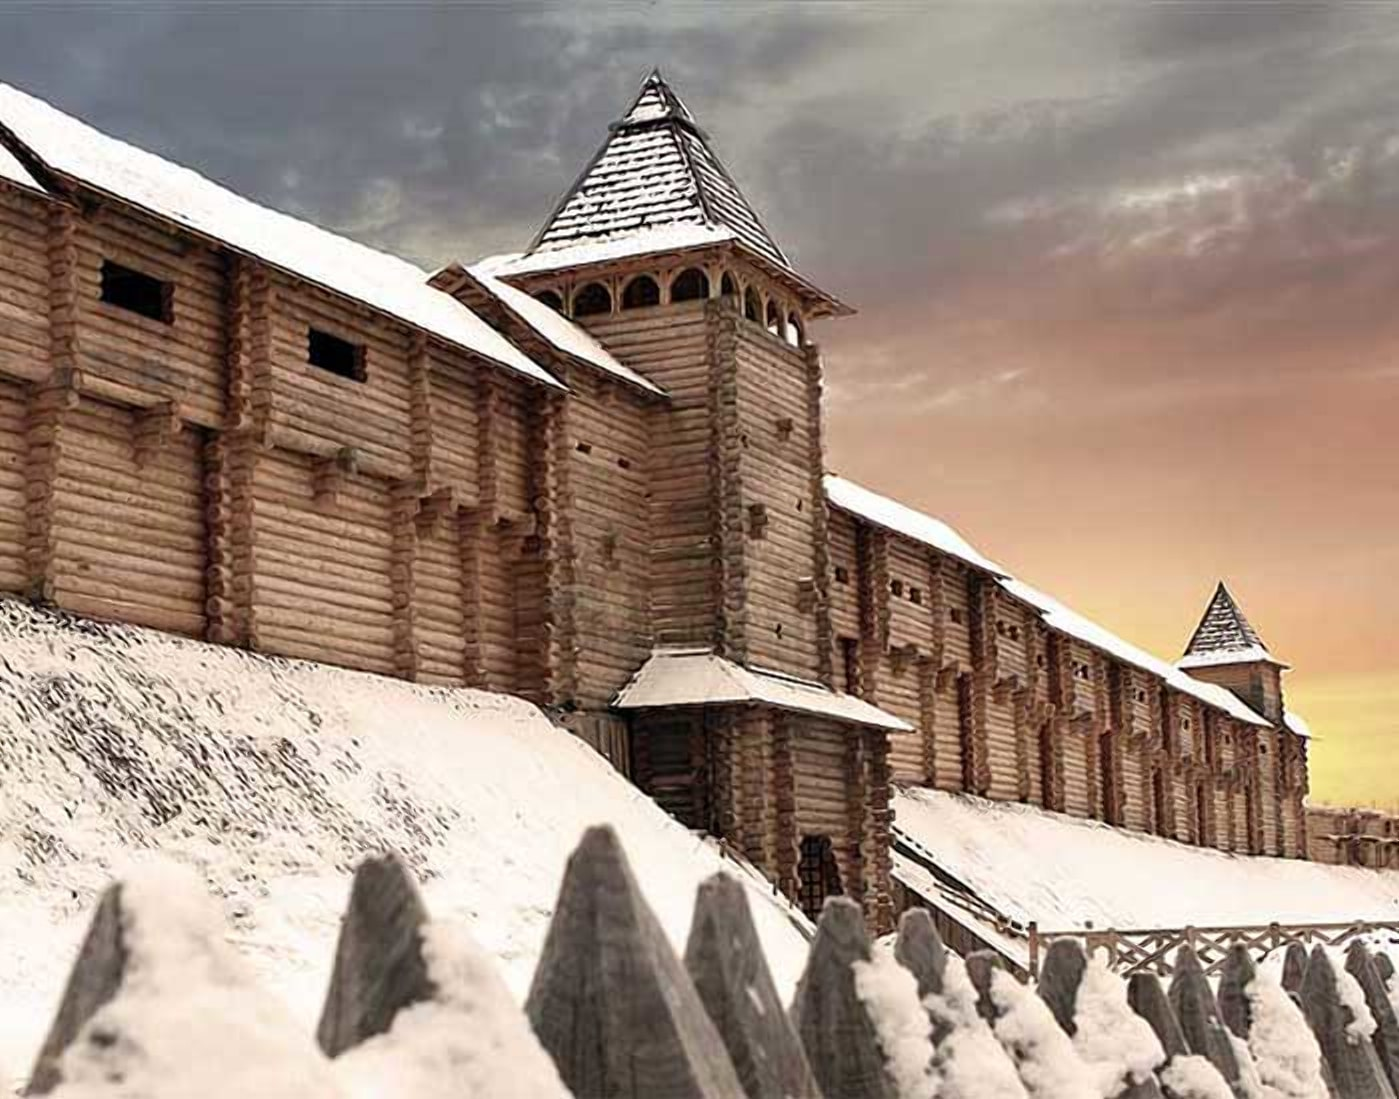 Старый пинский замок времен Войшелка